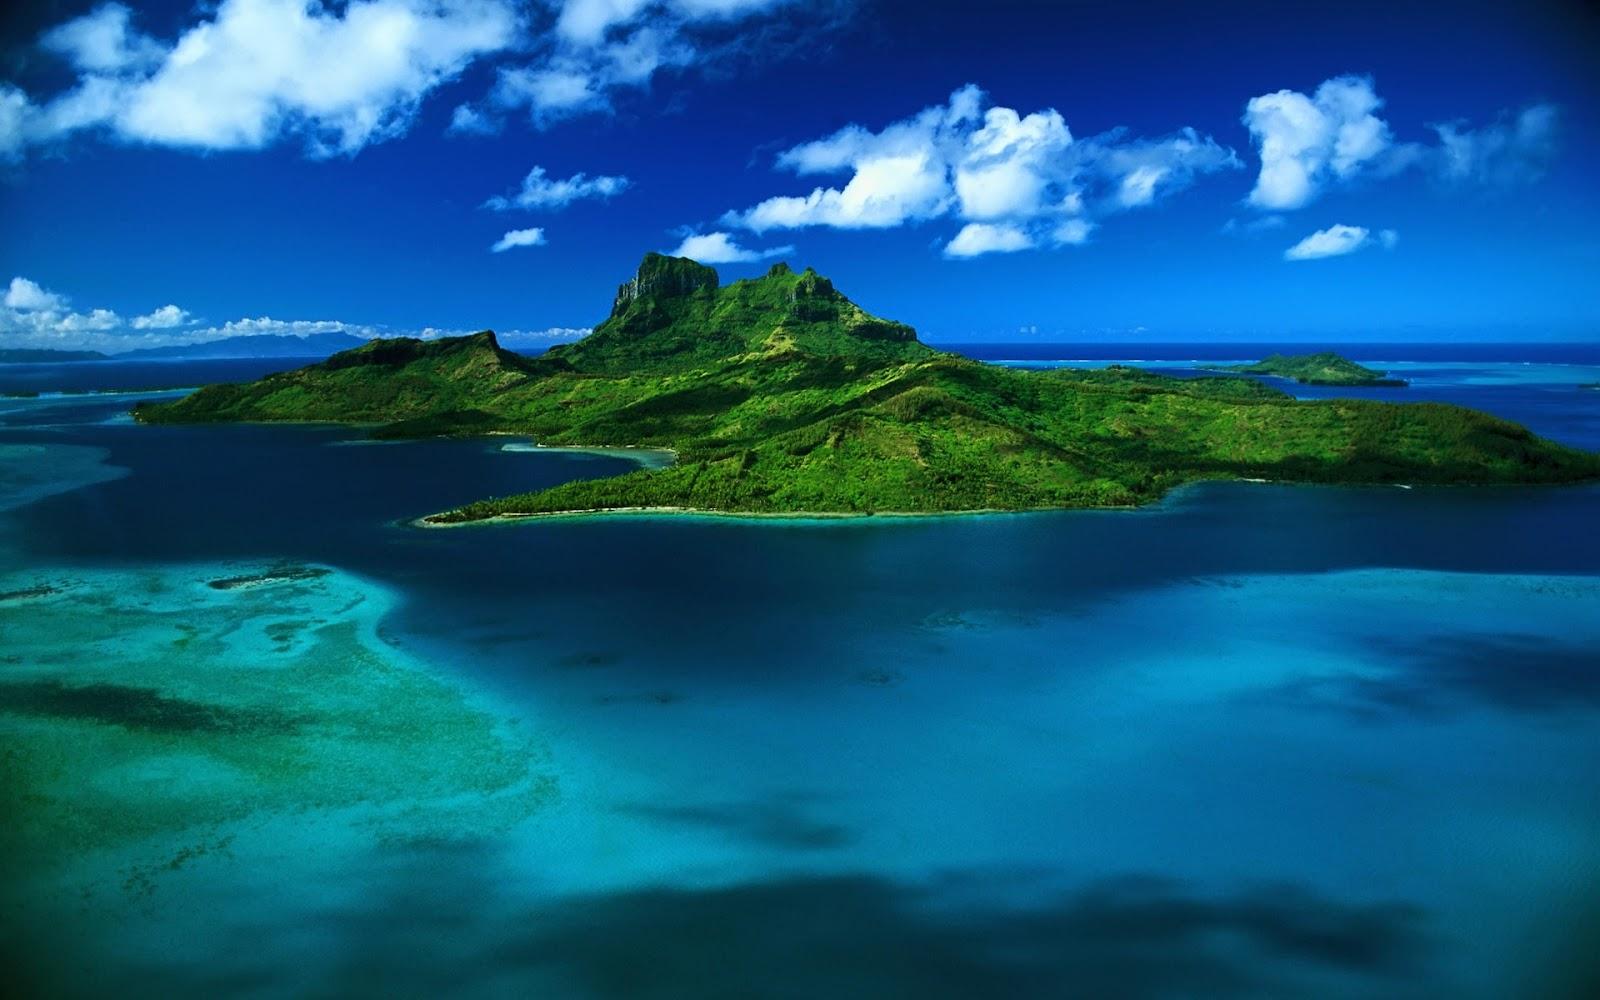 Trpical Island: Tropical Island